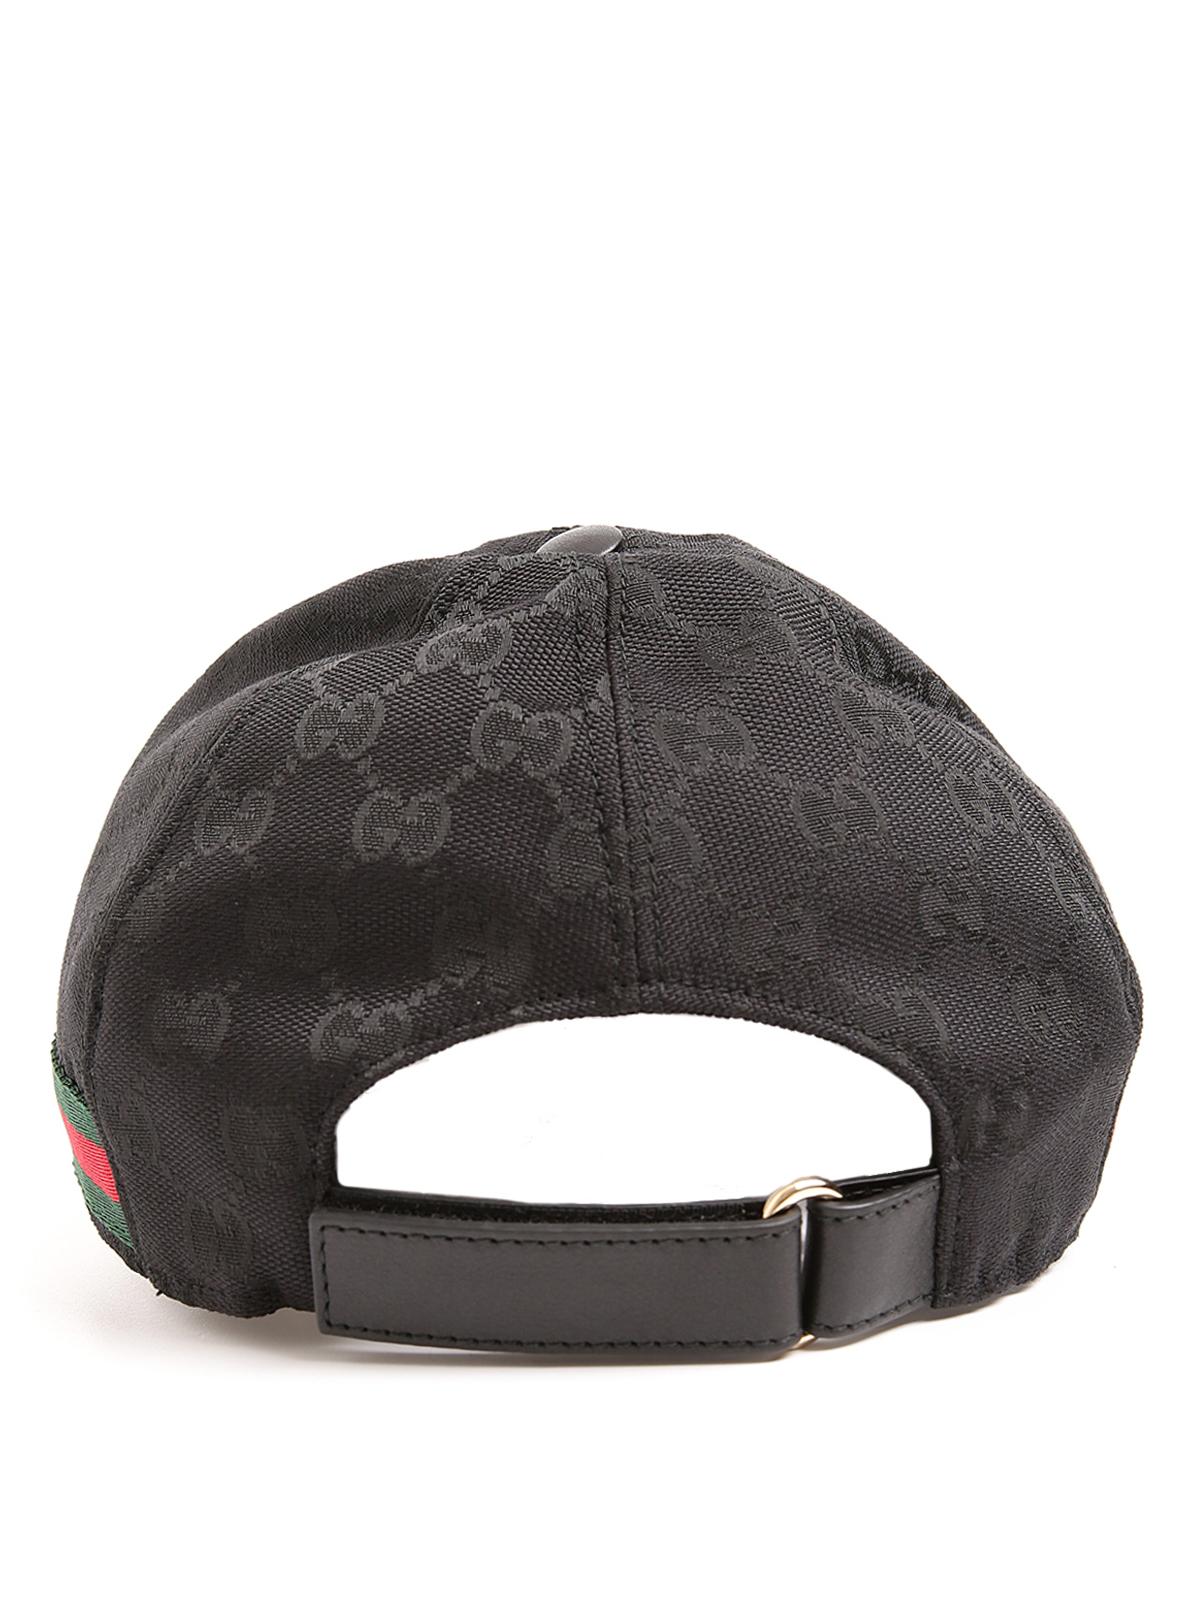 95e515854fe0a Gucci Gg Supreme Bee Hat Baseball Rap 426887 4HB12 - 2160 DK BROWN BLACK  black gucci hat